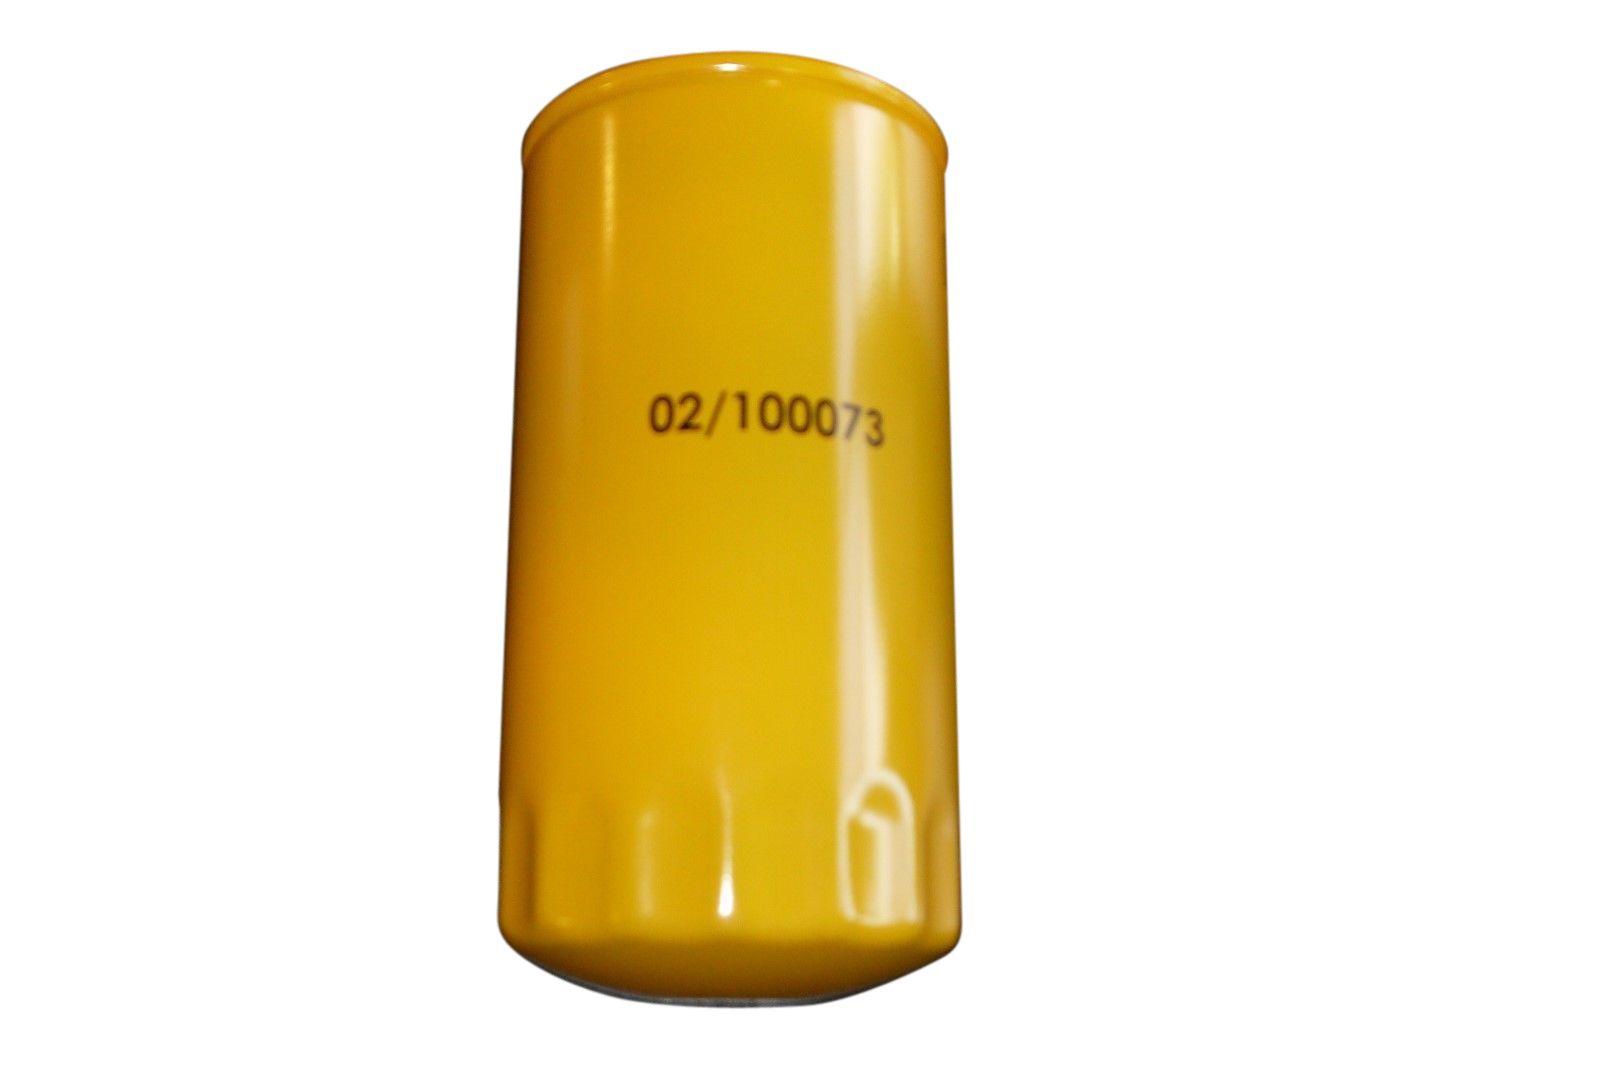 JCB PARTS OIL FILTER 02/100073A